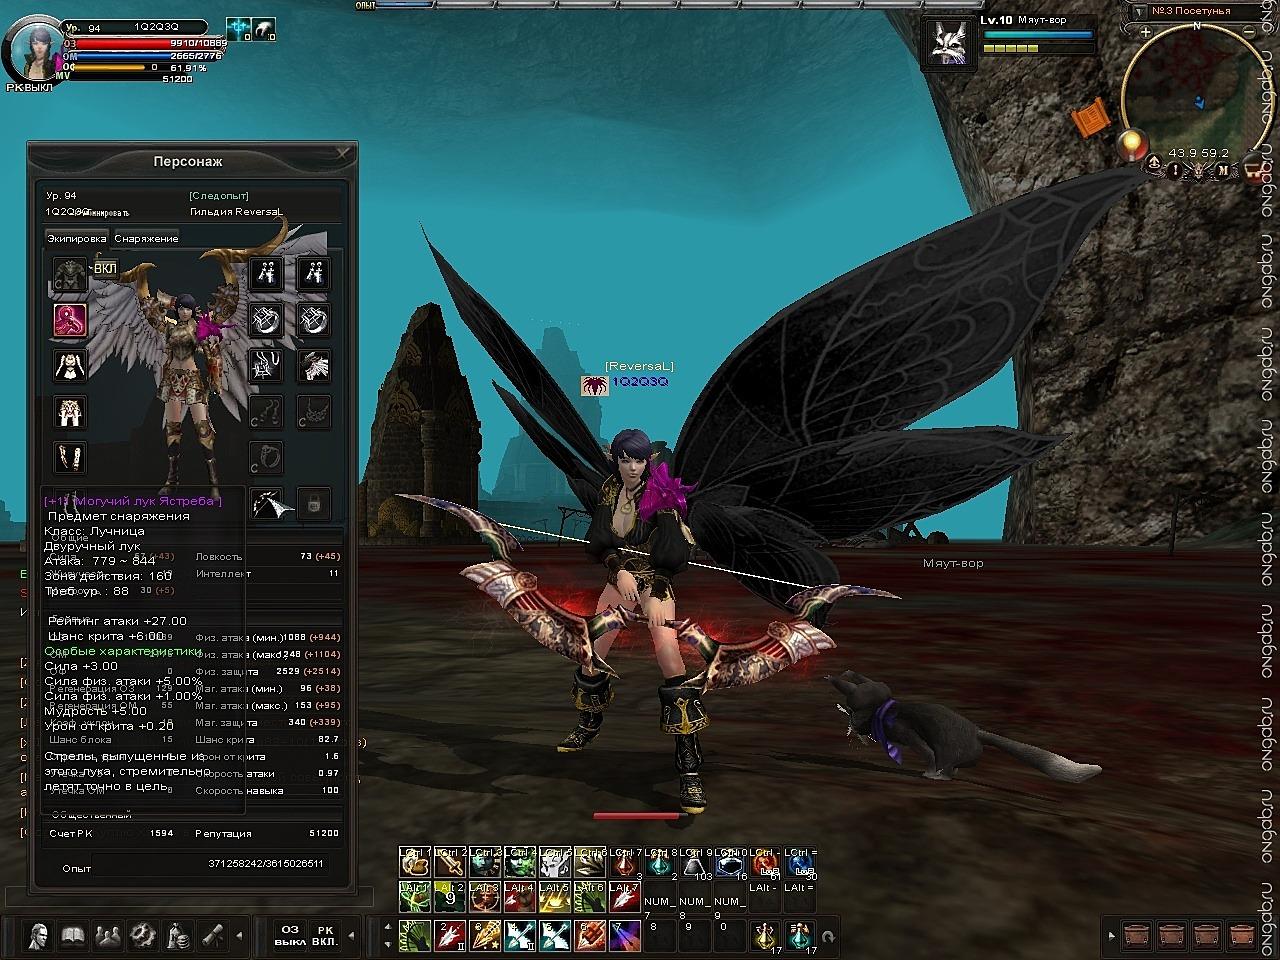 Скриншот Карос: Начало #225770